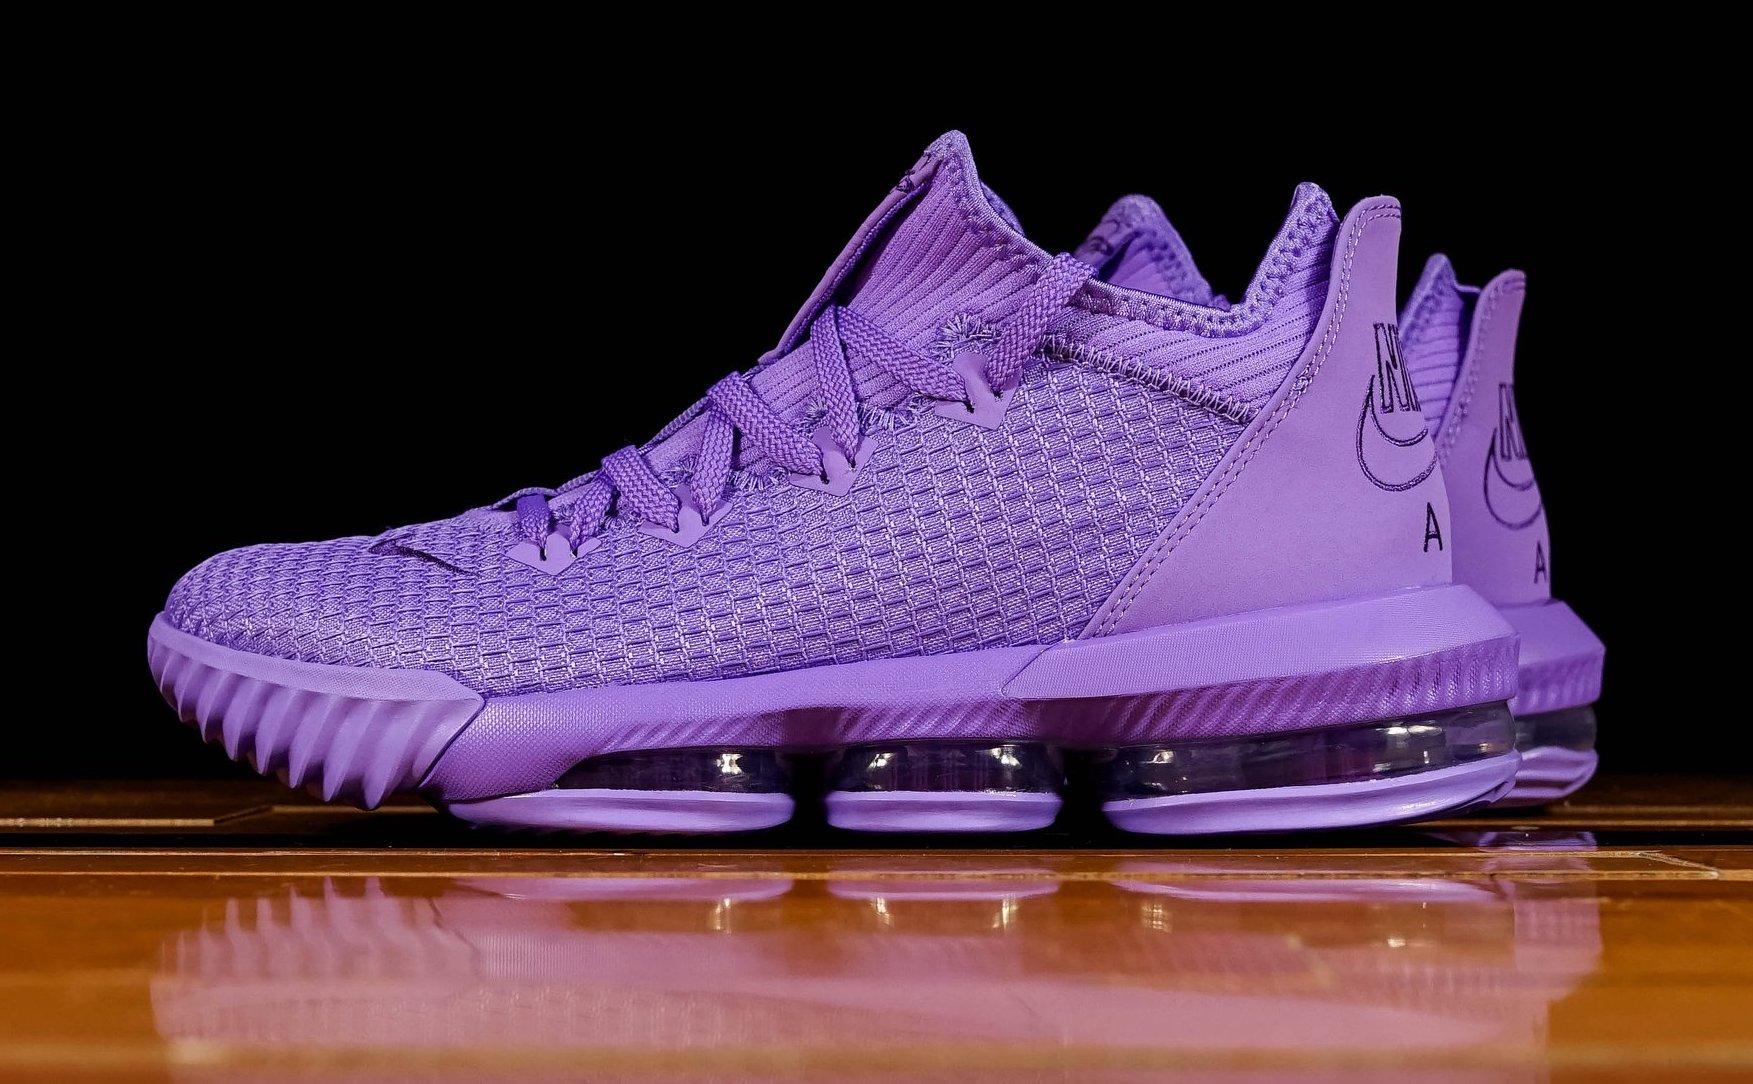 Nike LeBron 16 Low Atomic Purple Dropping Next Week • KicksOnFire.com